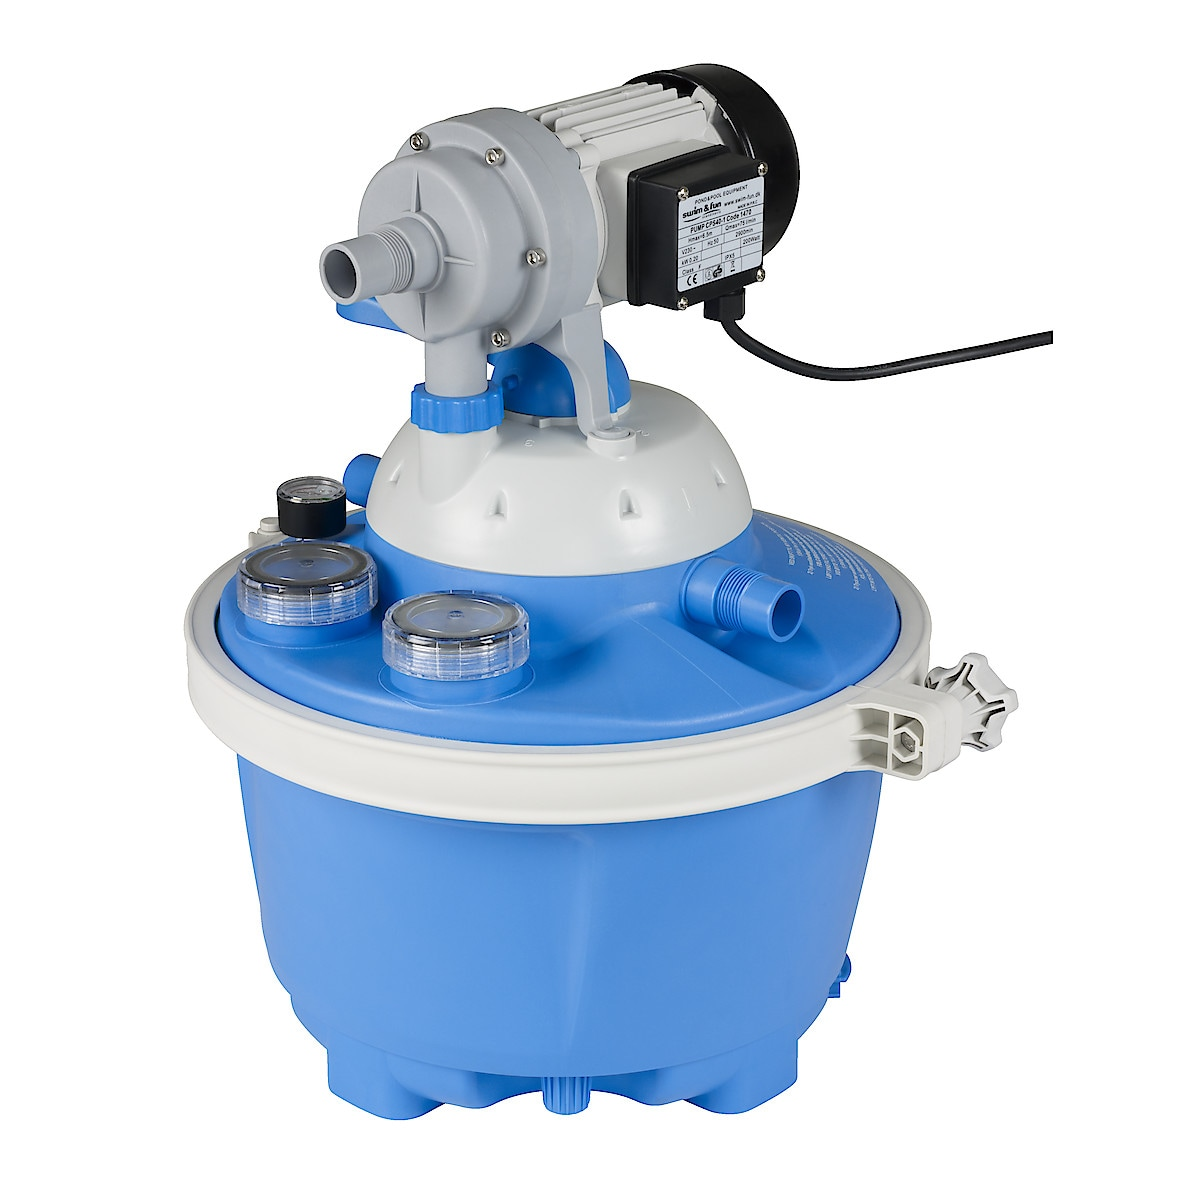 Basic 3 sandfilterpumpe